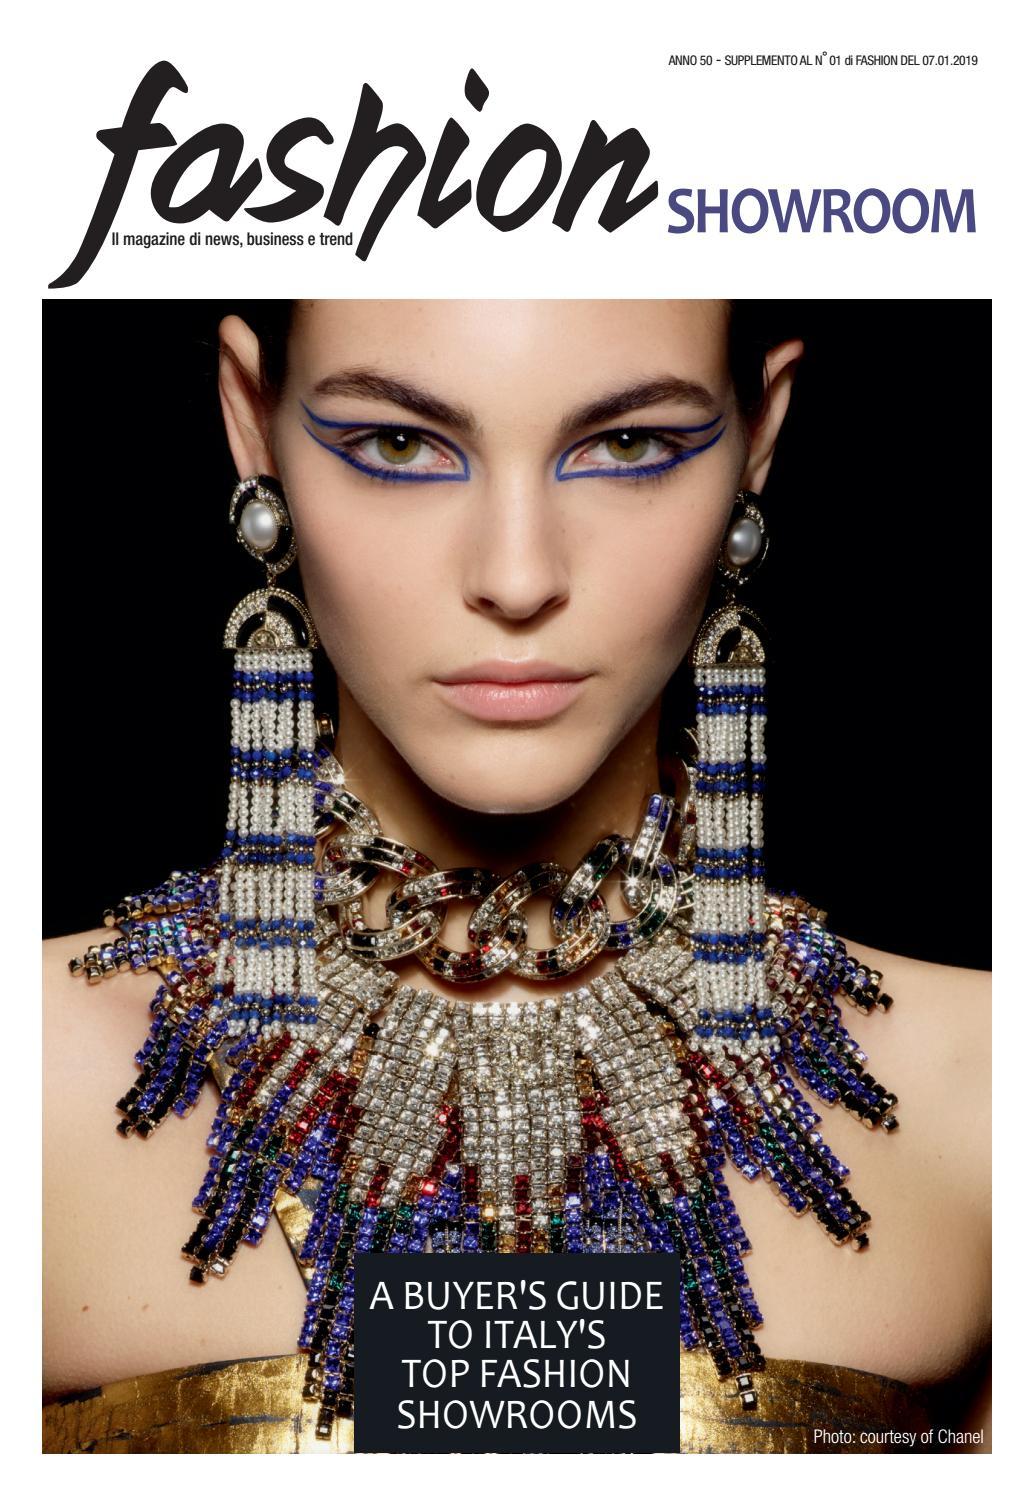 finest selection 905dc 057e5 FASHION SHOWROOM 1_2019 by Fashionmagazine - issuu